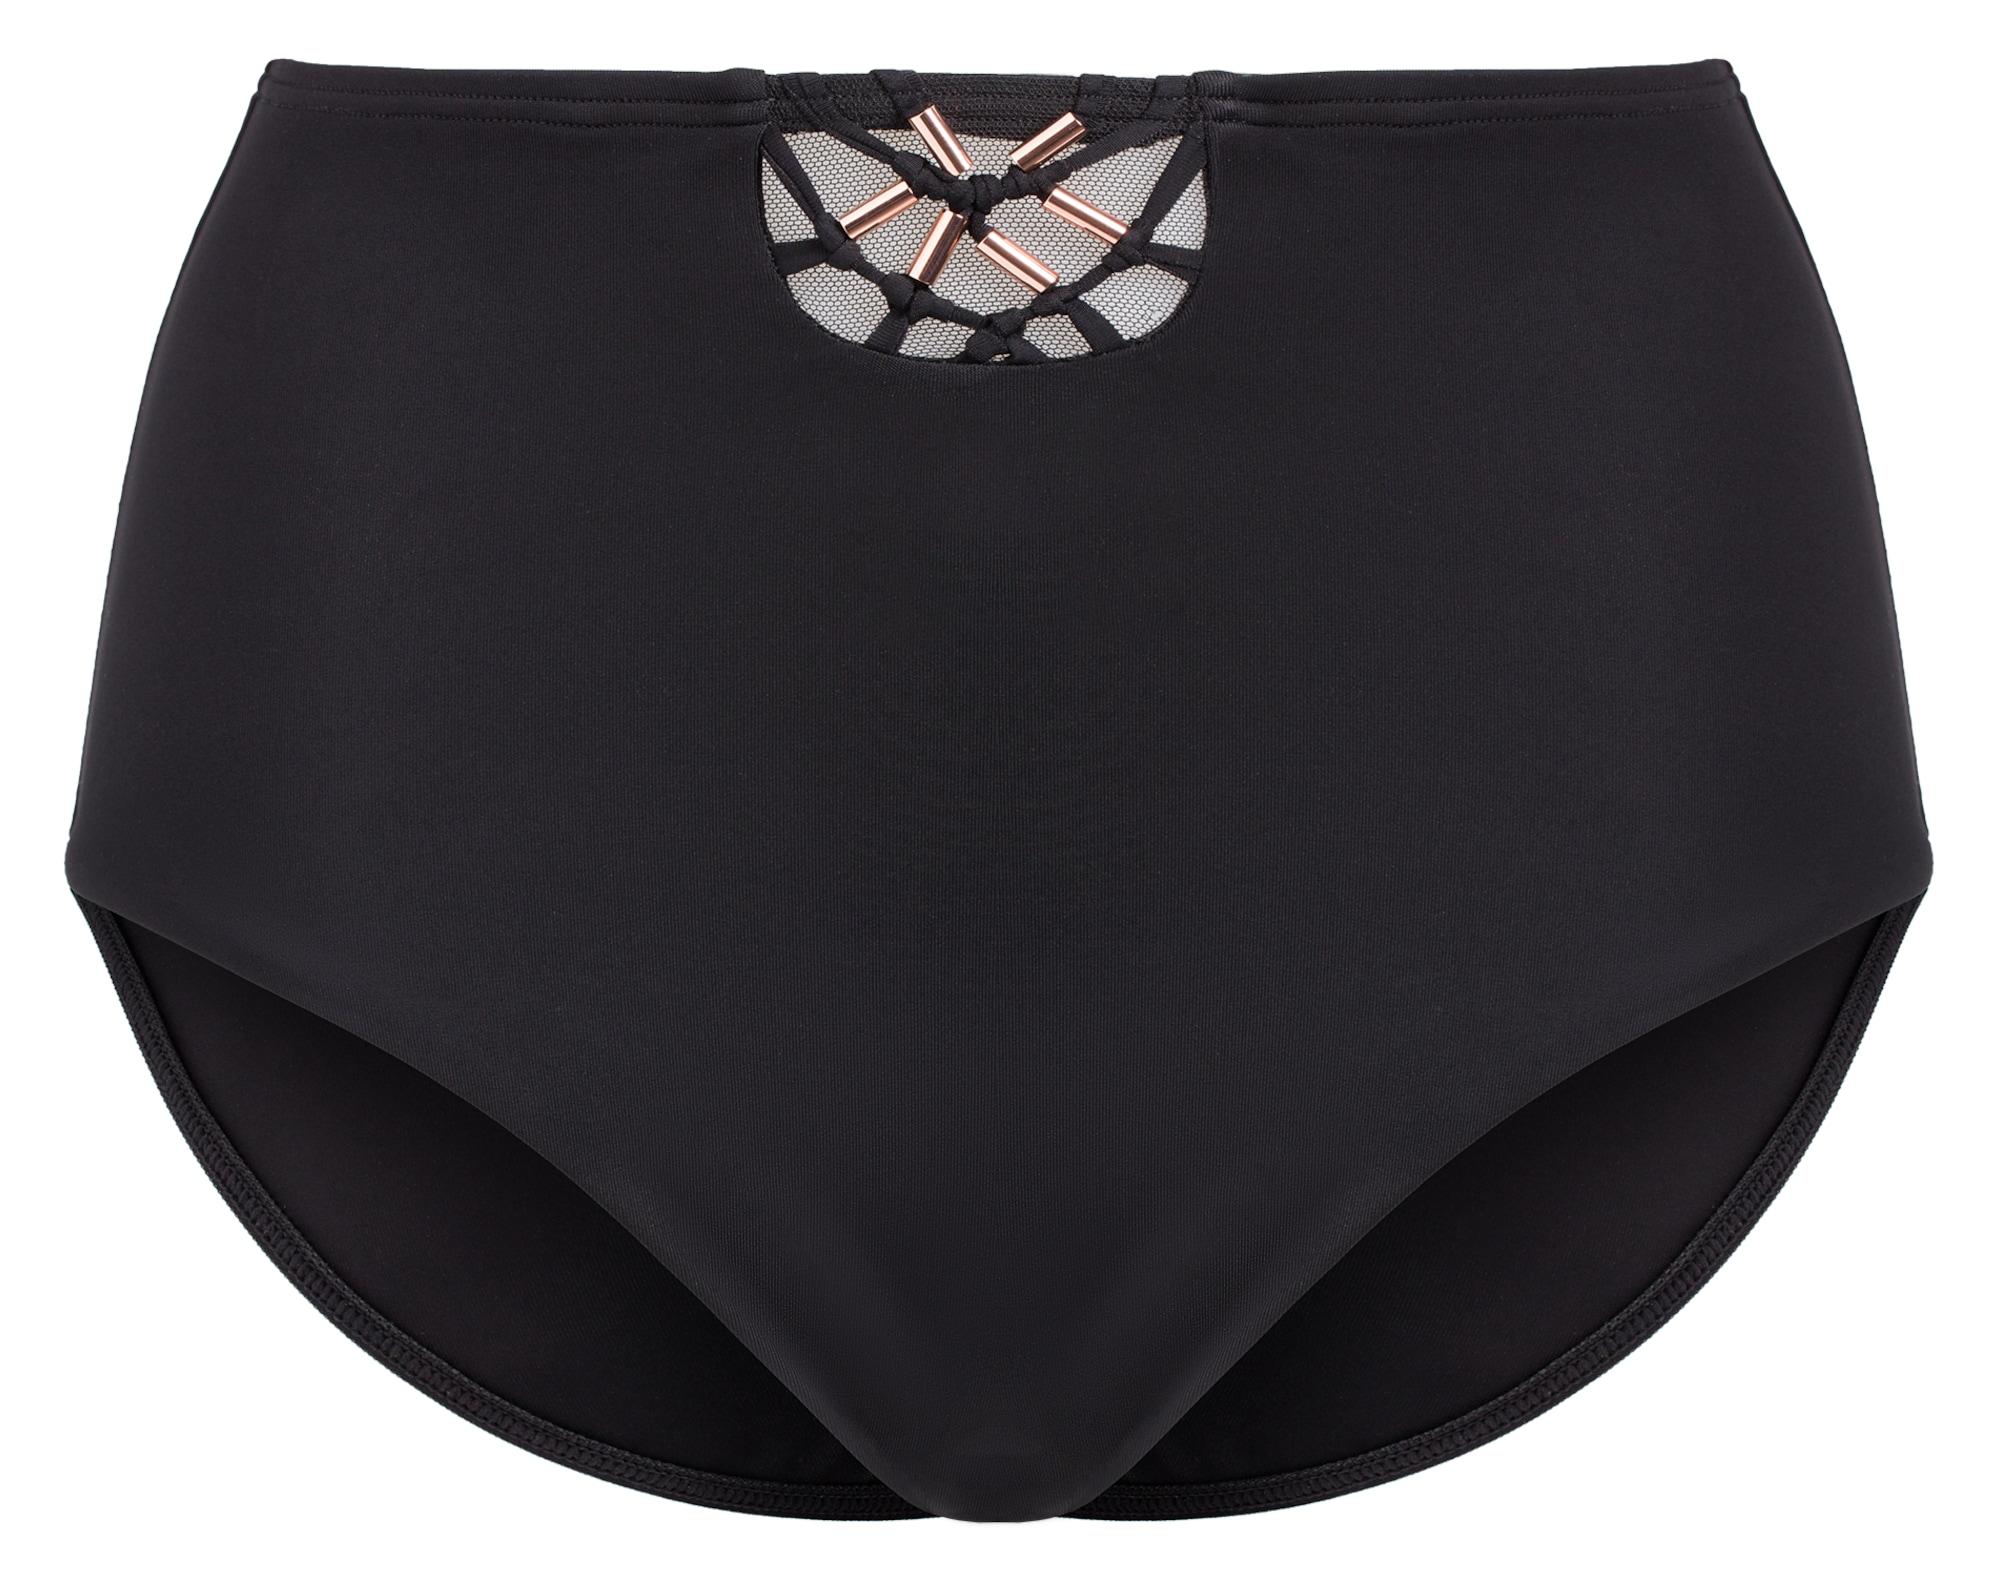 PALMERS, Dames Bikinibroek 'ROS BEACH', rose-goud / zwart